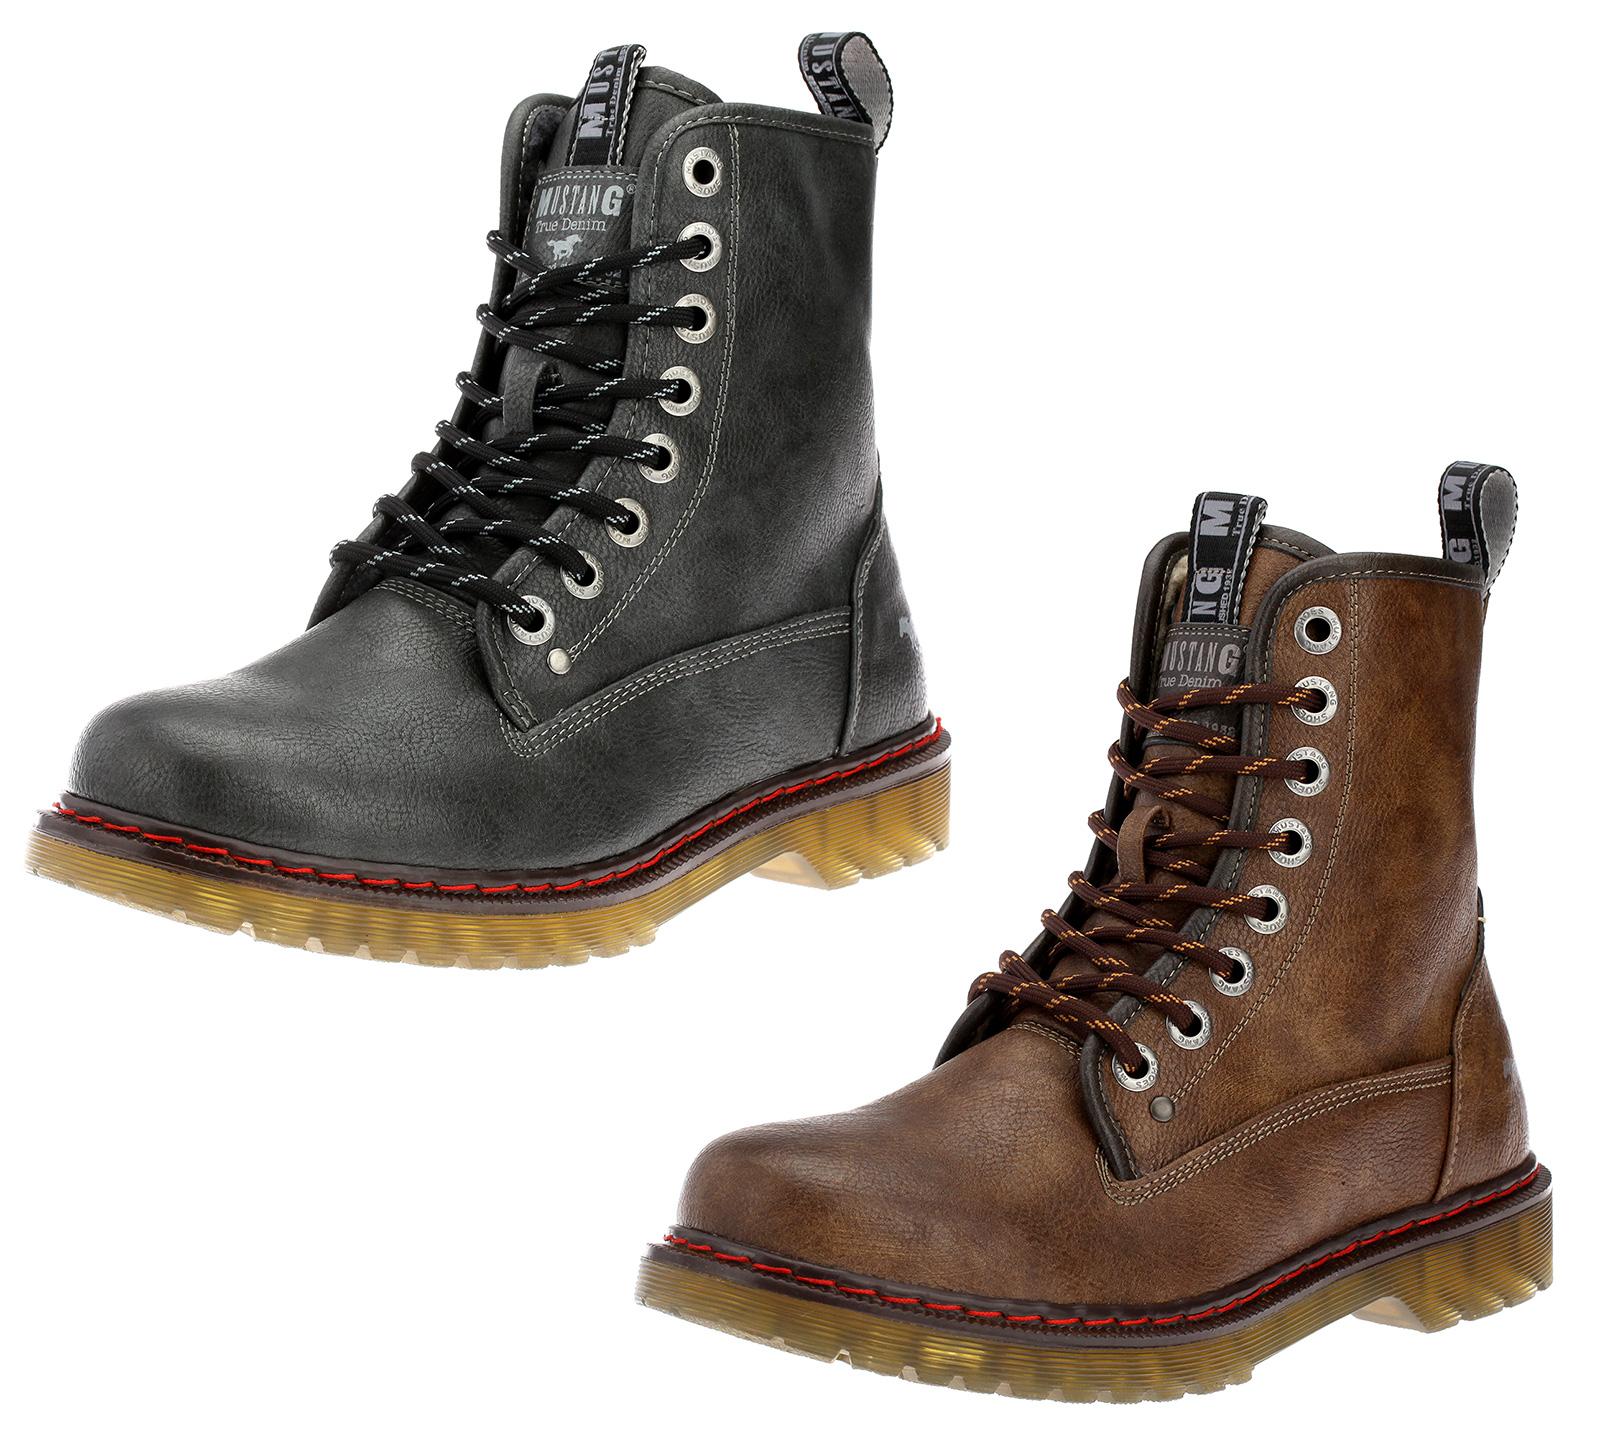 Neu MUSTANG Herrenschuhe Stiefel Herrenstiefel Boots Stiefeletten Schuhe Braun